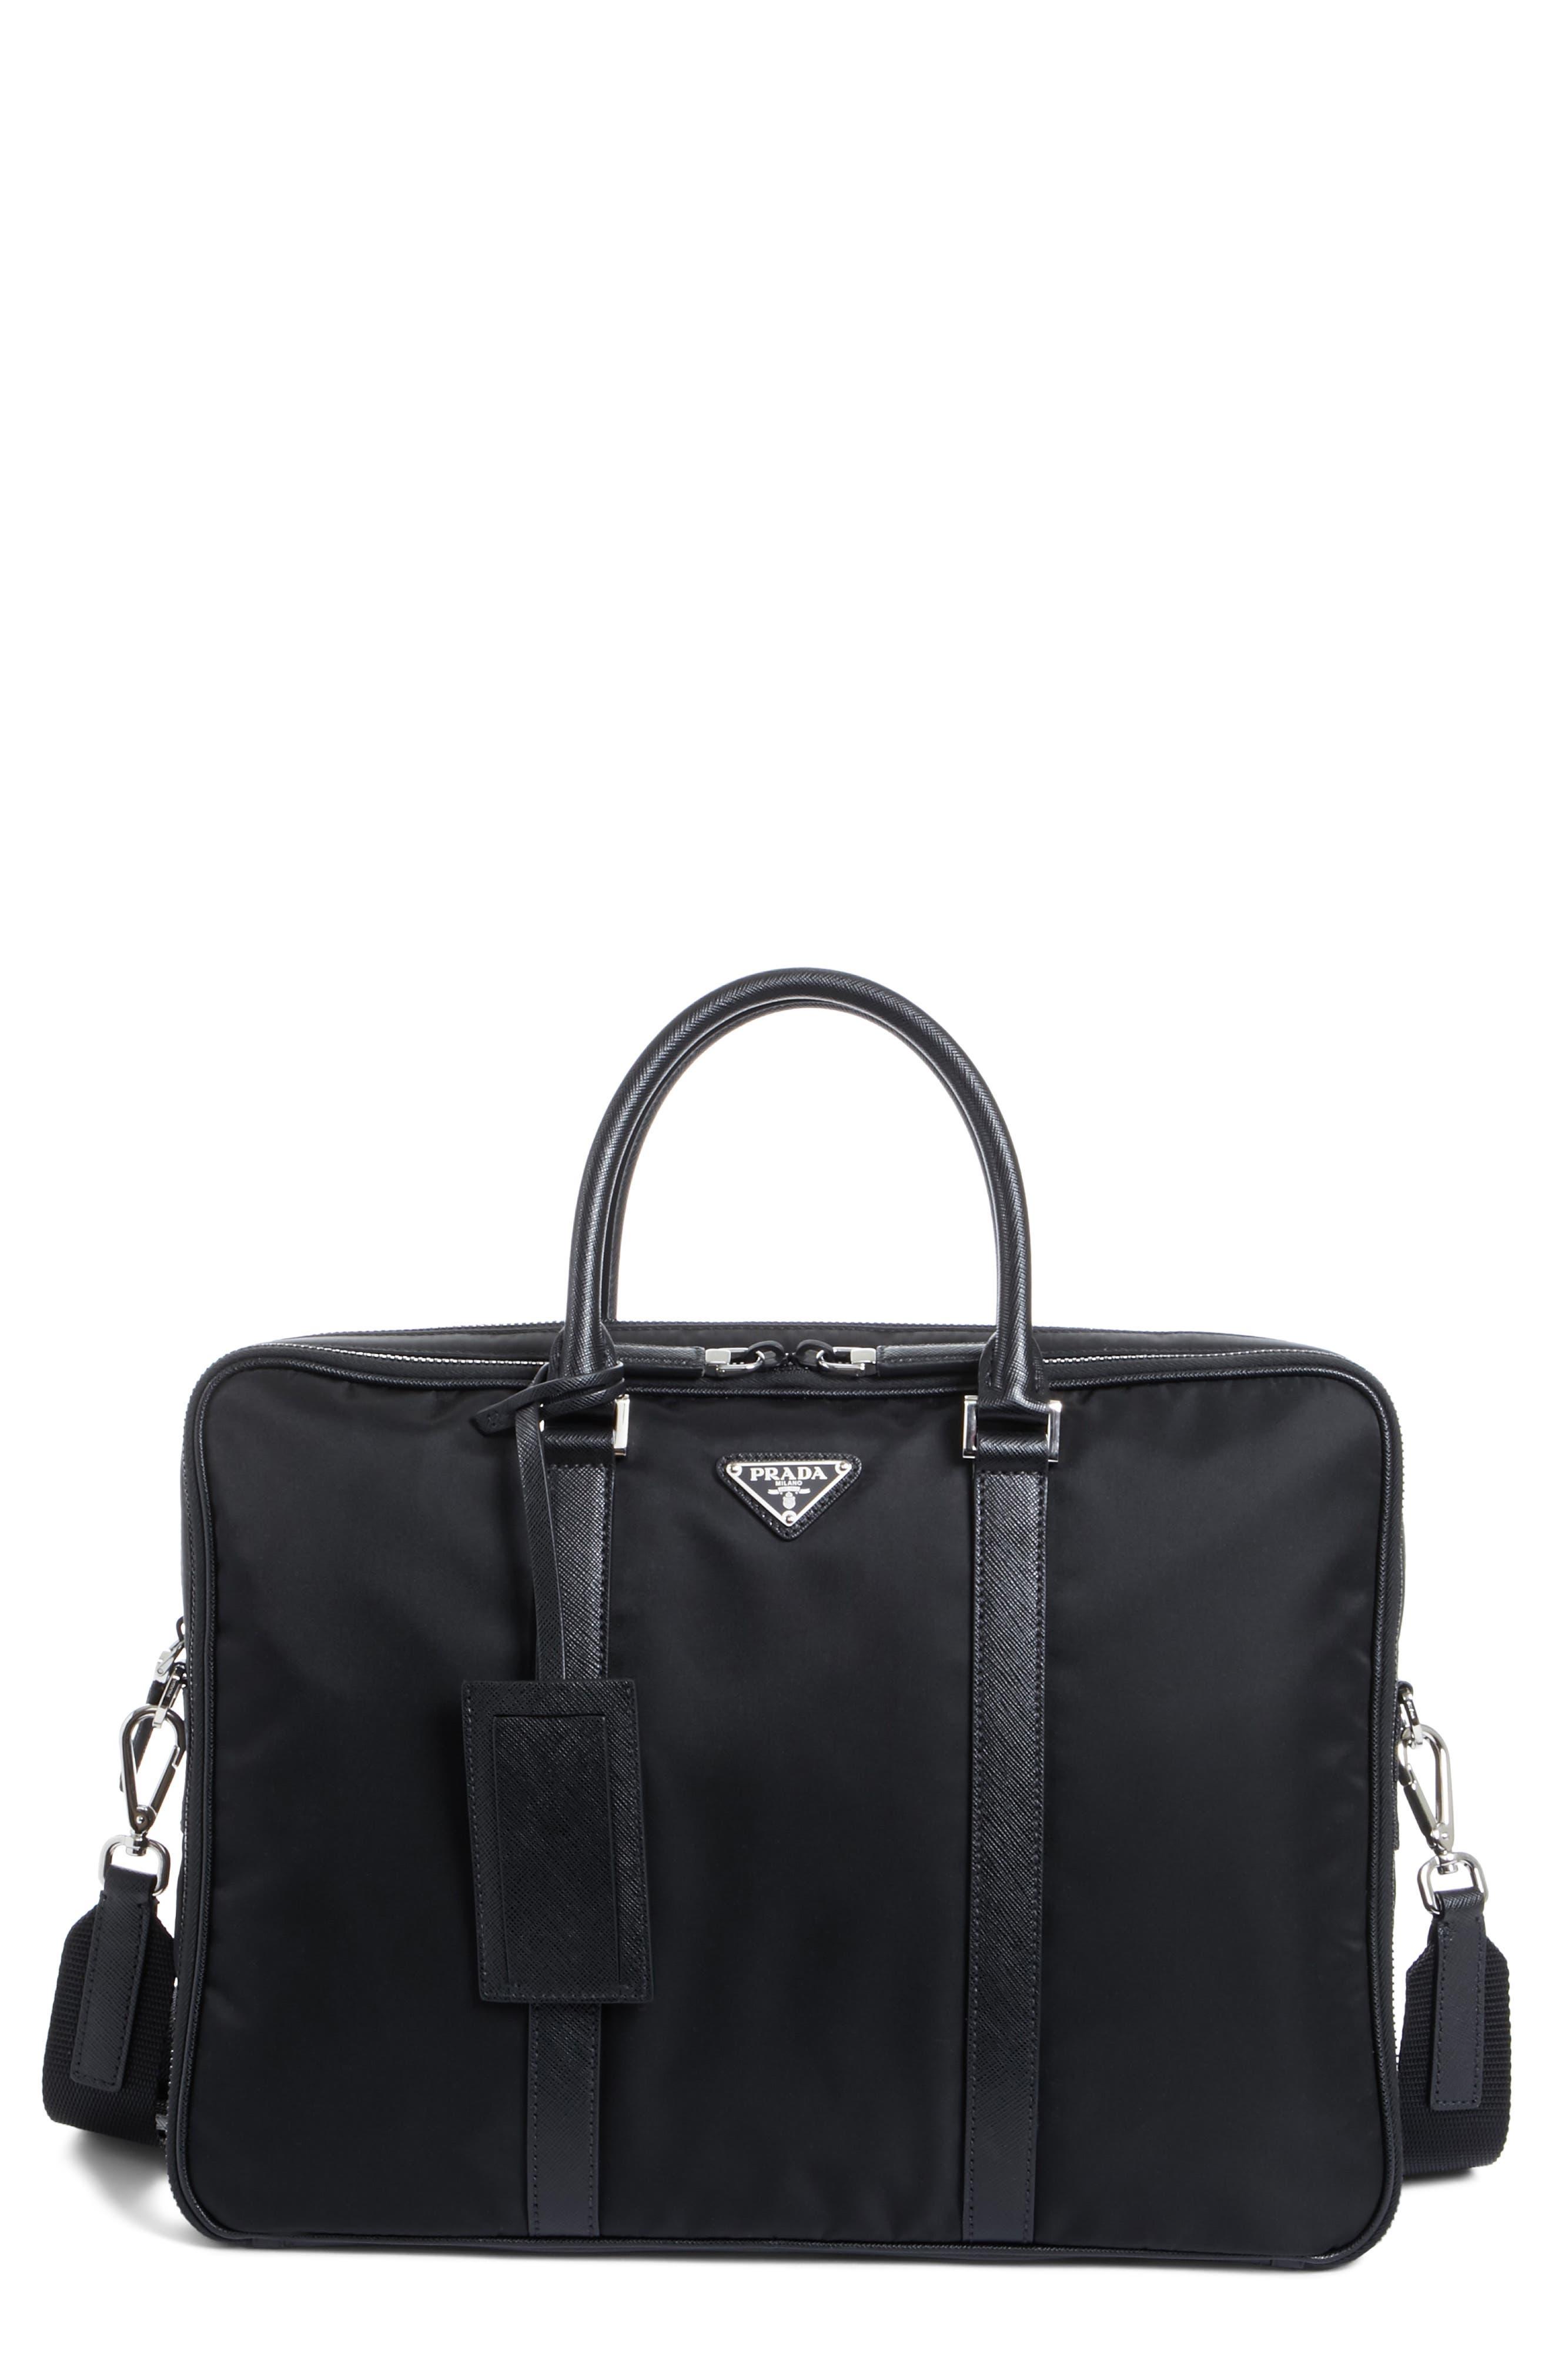 Prada Nylon Briefcase with Saffiano Leather Trim